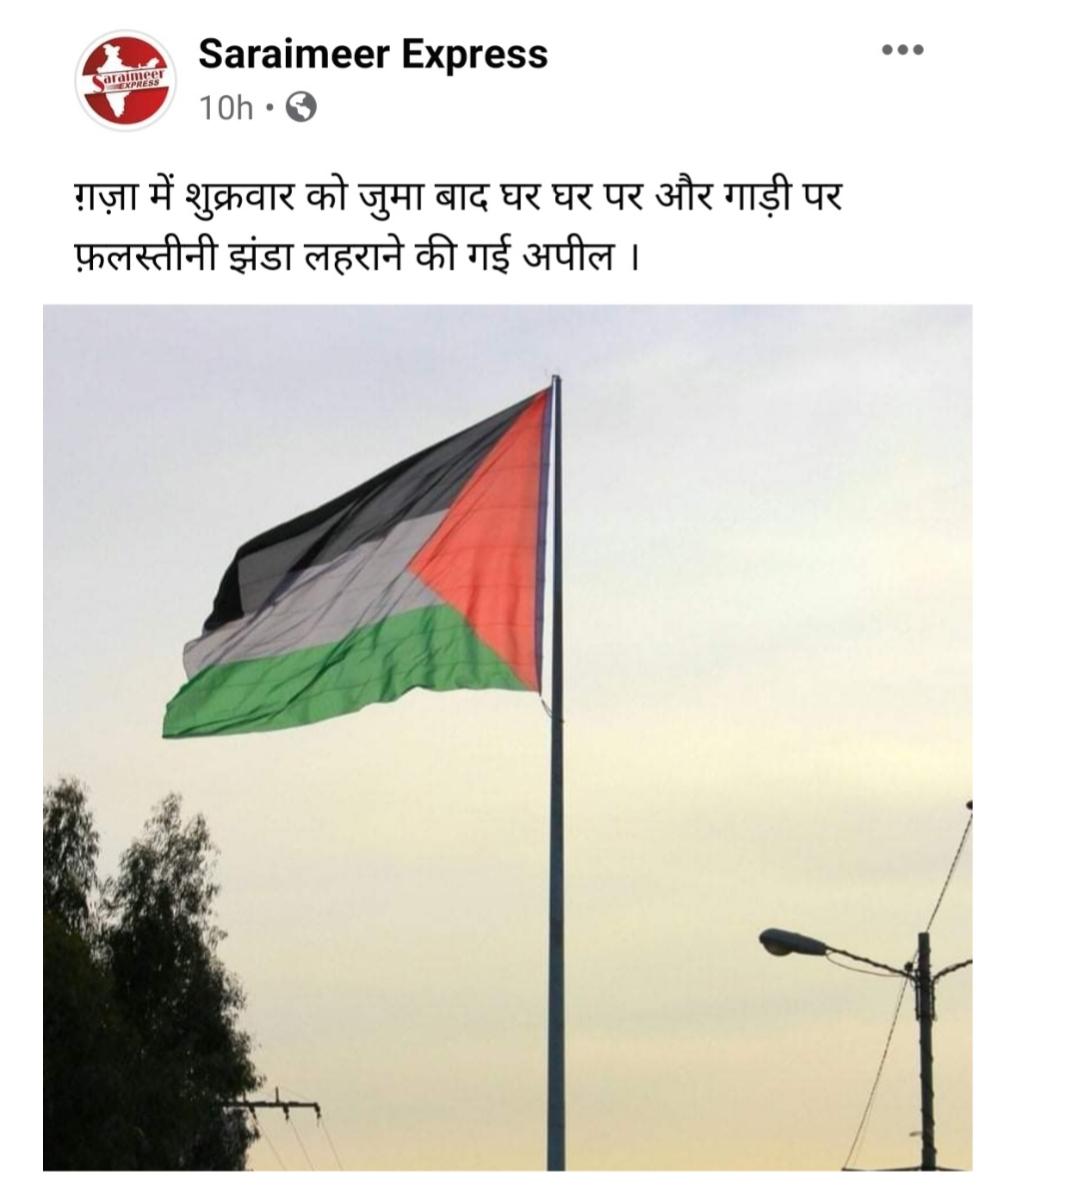 India, Yasir akhtar, Azamgarh, facebook, Gaza, Palestine, UP police, uttarpradesh, Harbouchanews